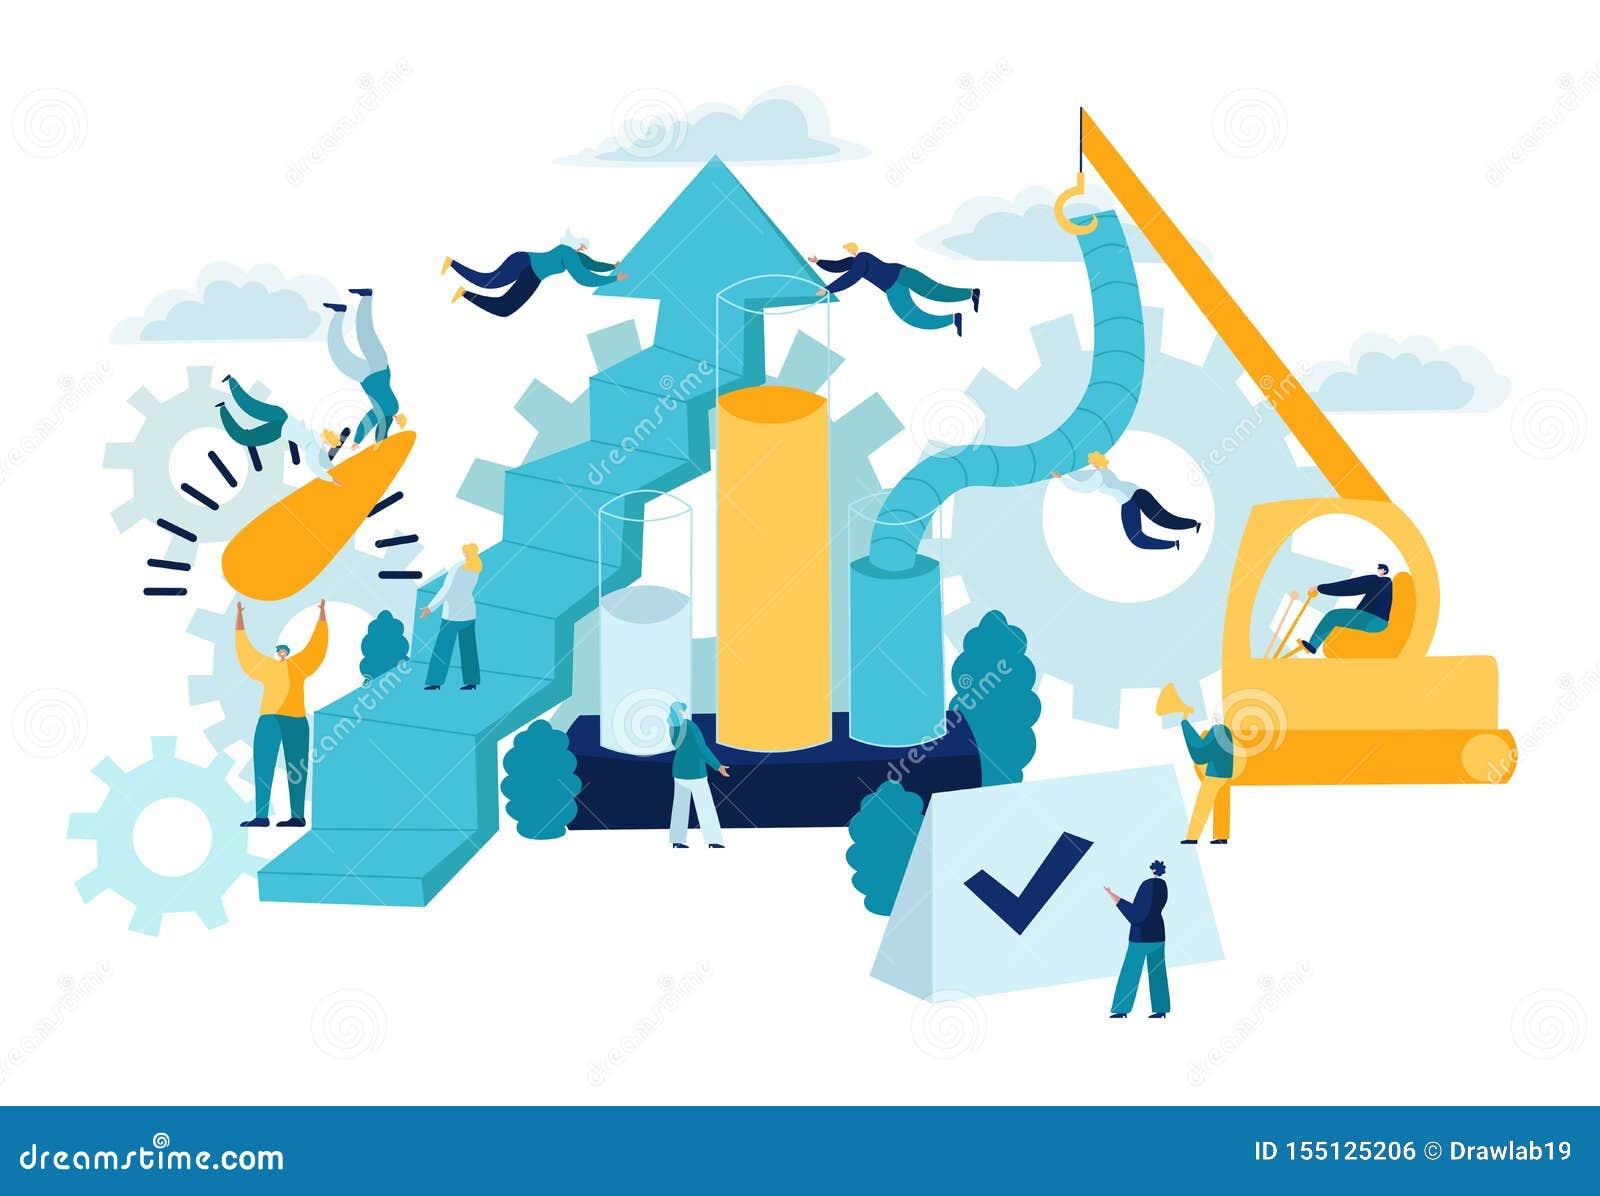 KPI概念、评估、优化、战略、清单和测量 主要绩效Indicatorsusing事务